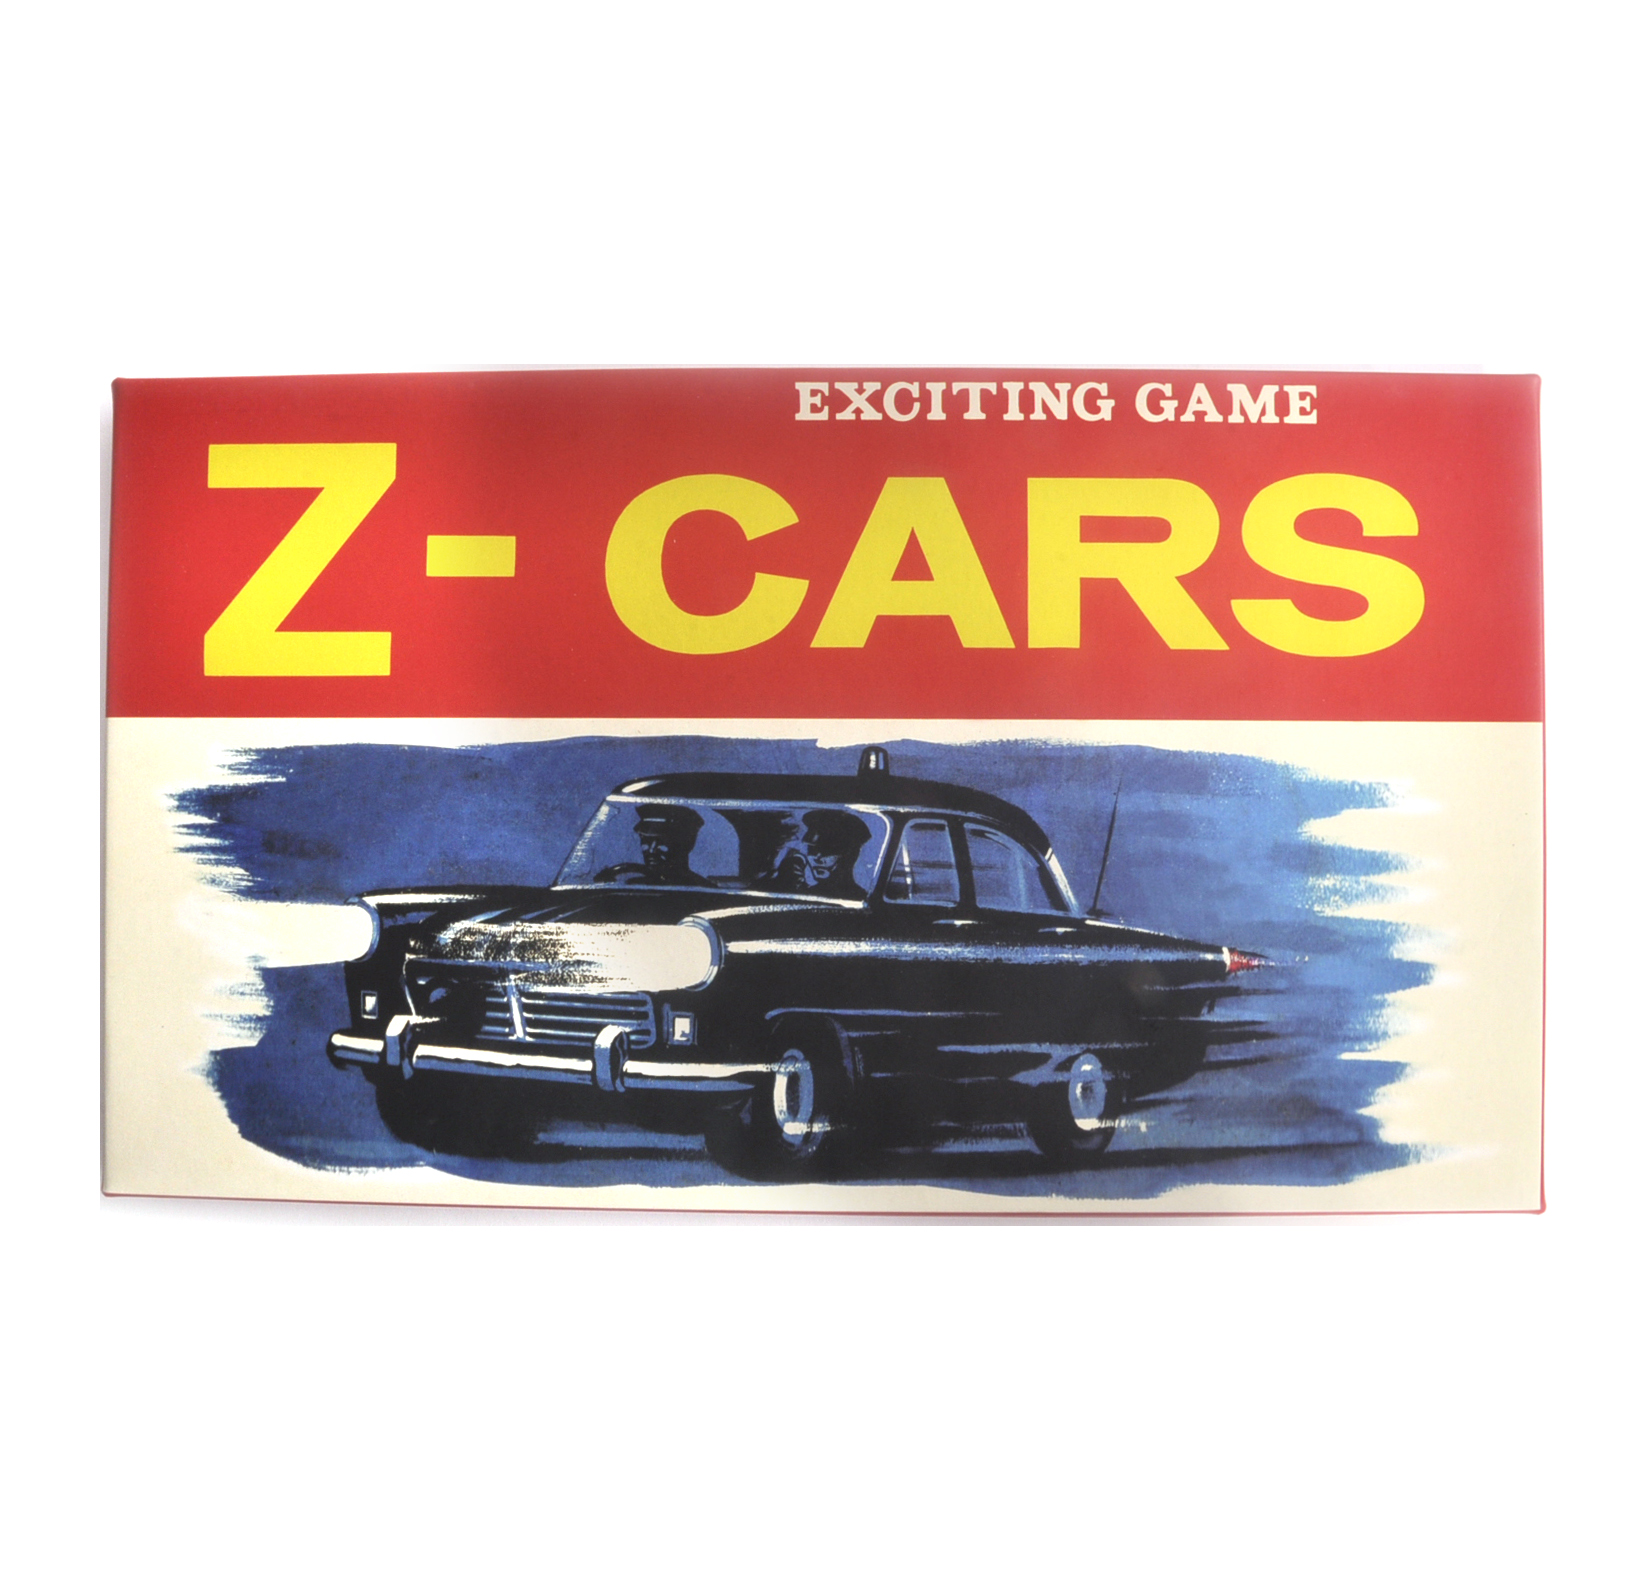 Z Cars The Classic 1960s TV Series Retro Board Game